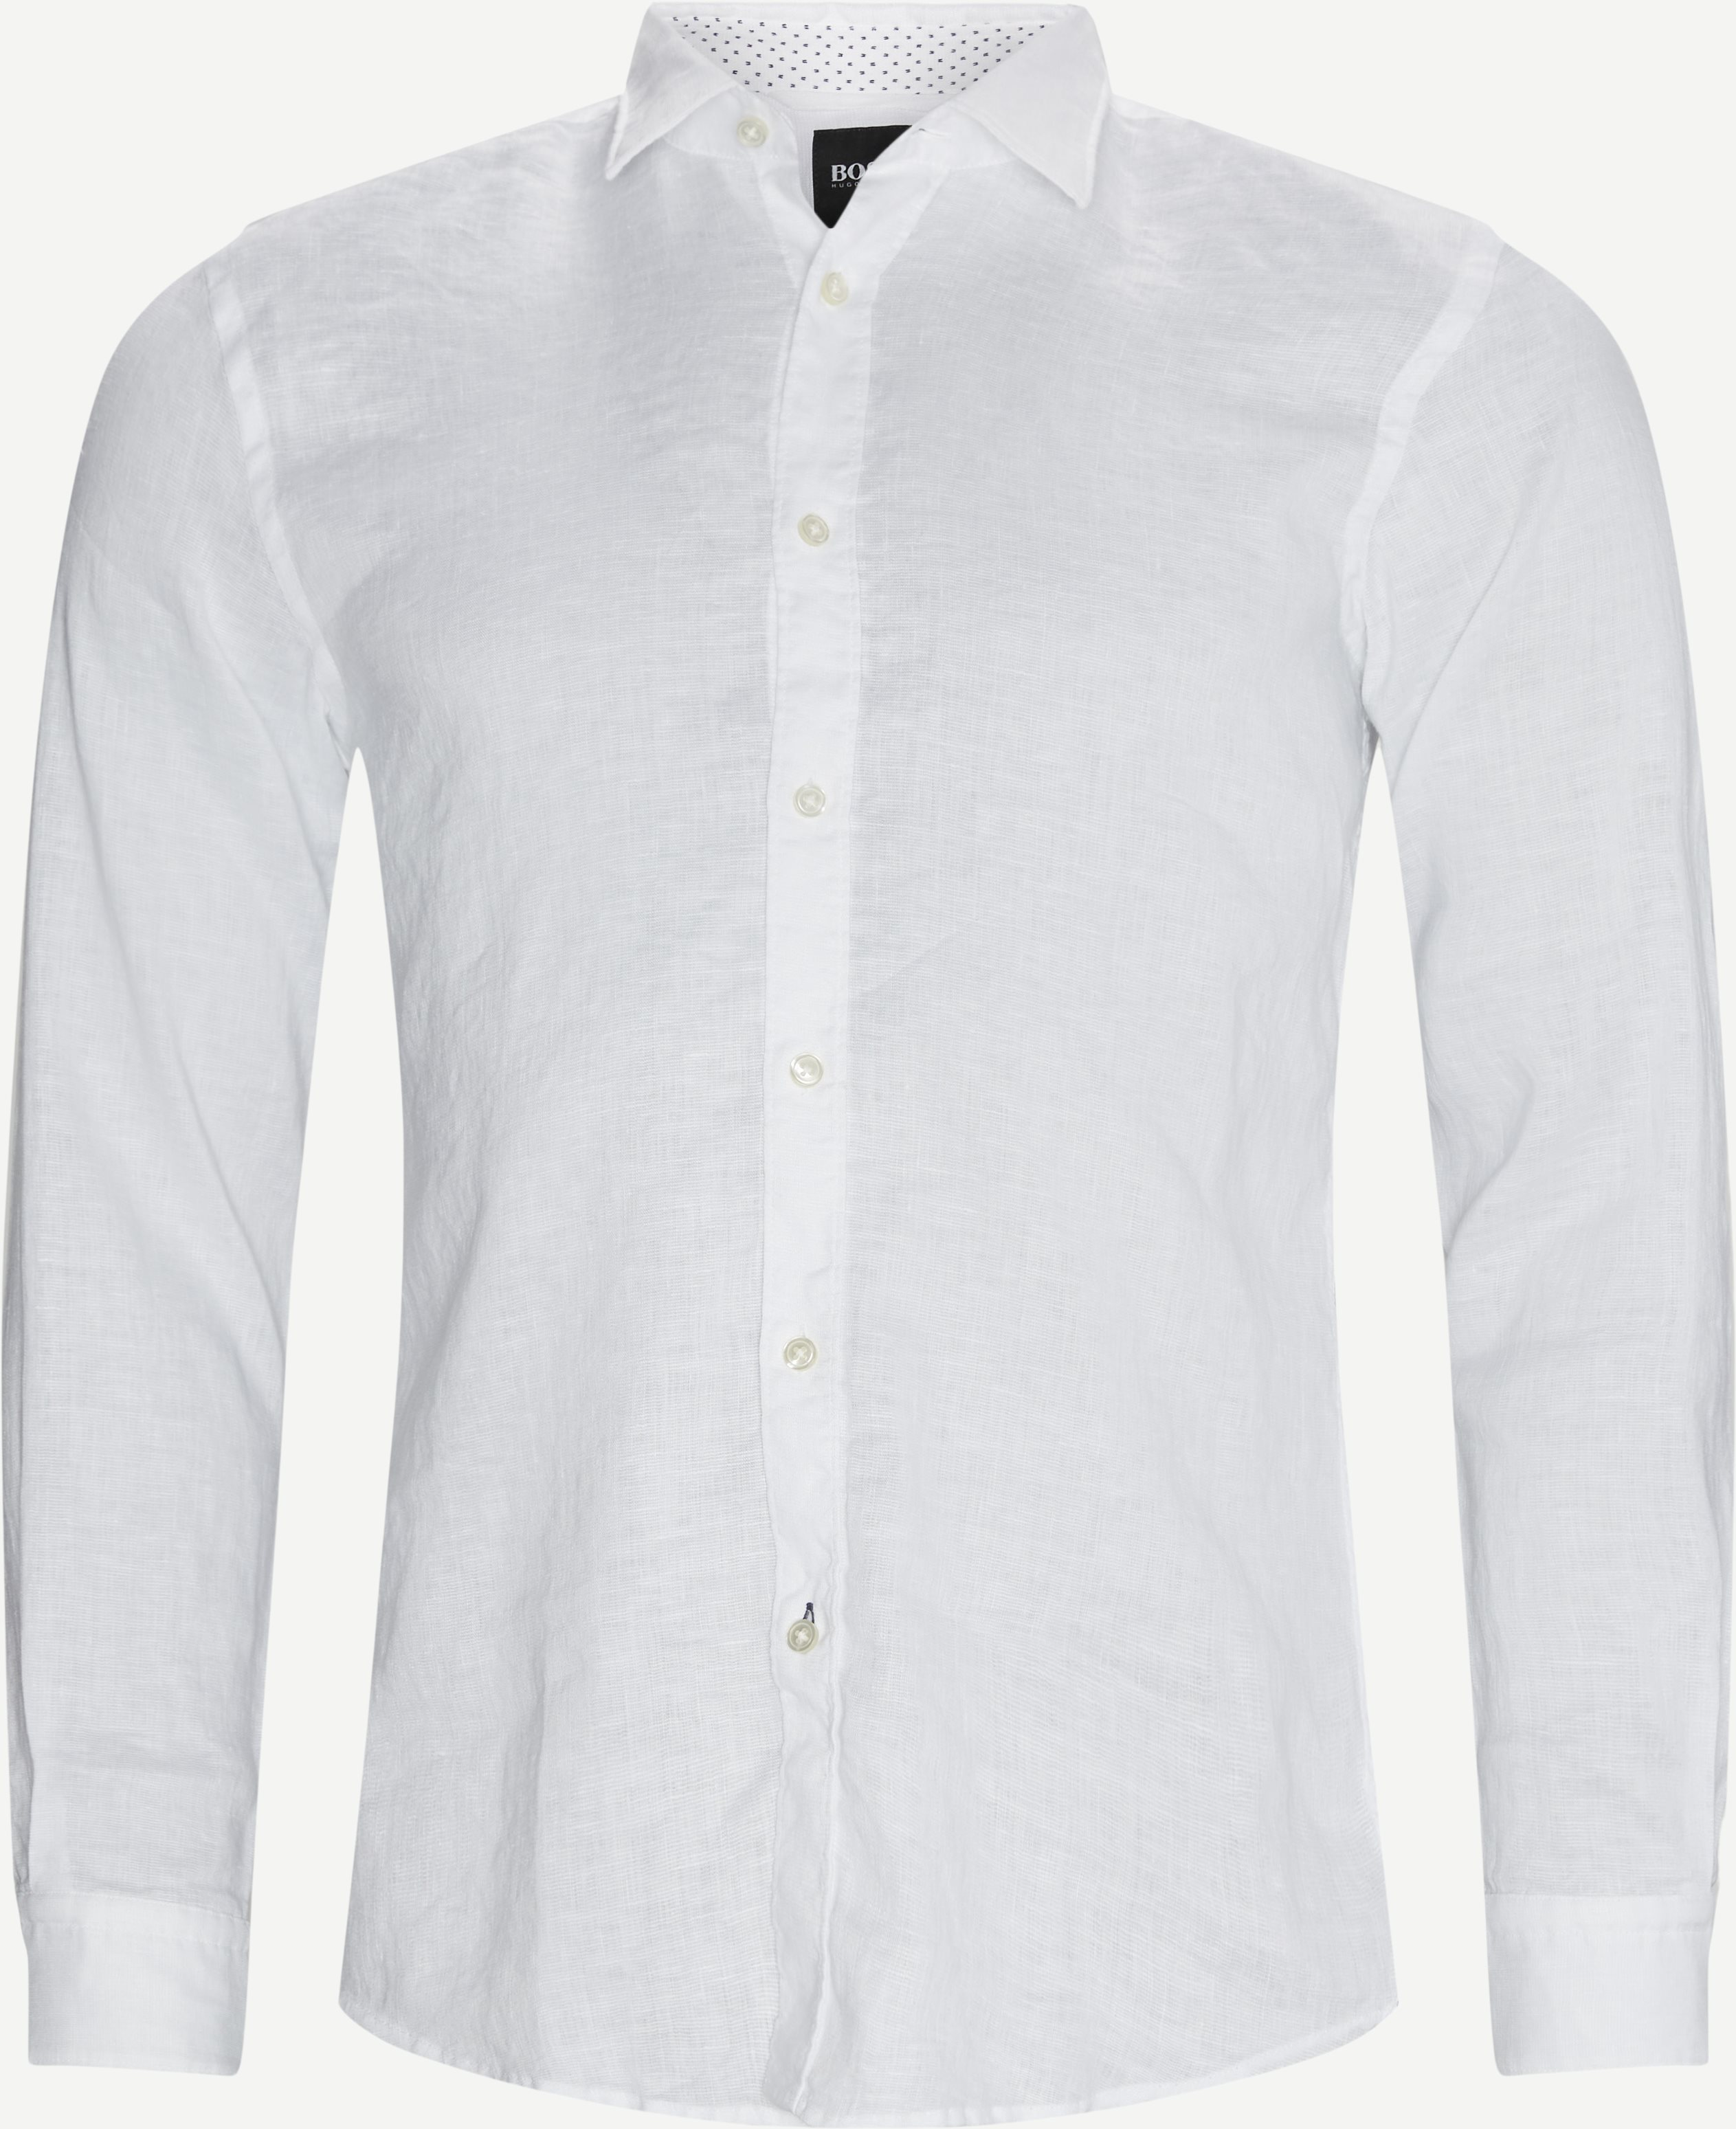 Ronni_53 Shirt - Skjortor - Slim - Vit